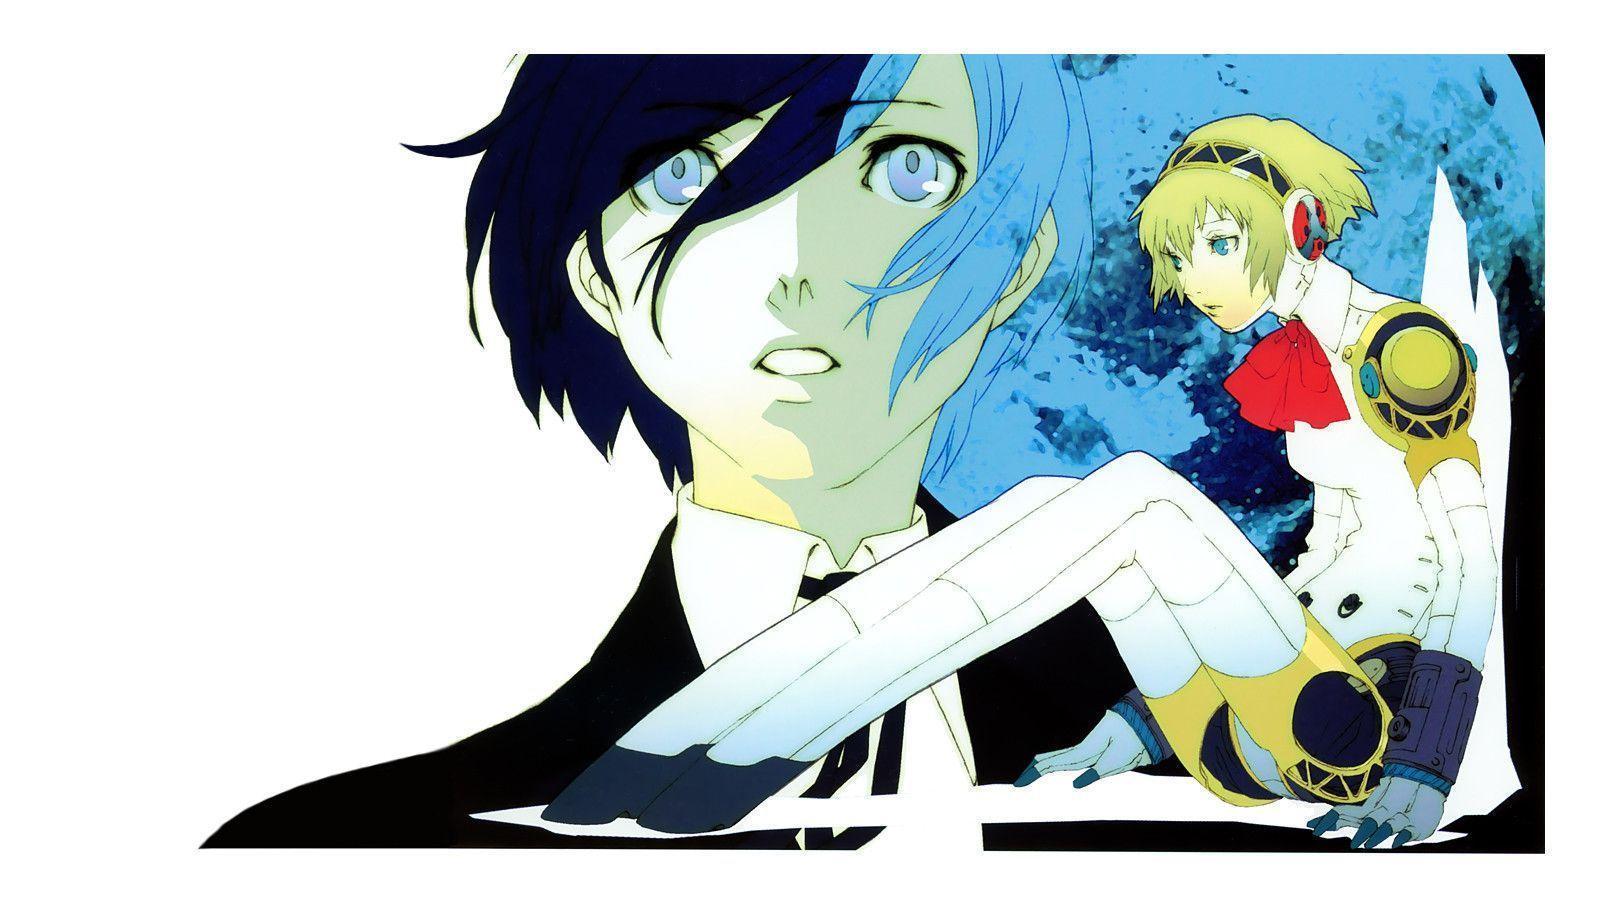 Persona 3 Wallpapers - Wallpaper Cave